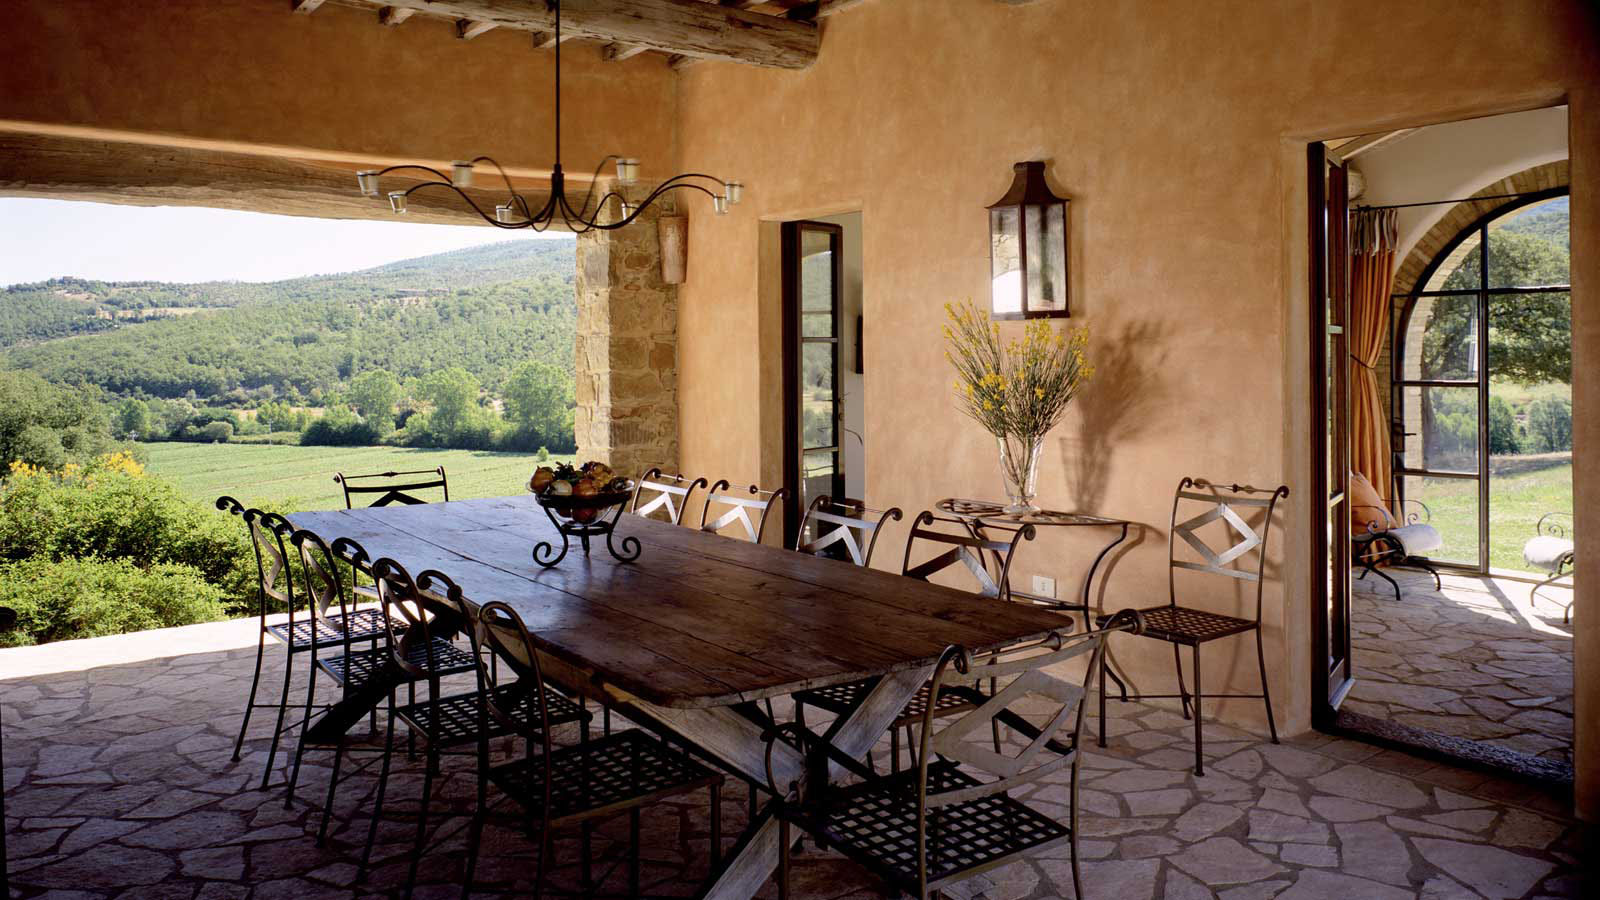 restaurant kitchen flooring commercial sinks brusceto-castello-di-reschio